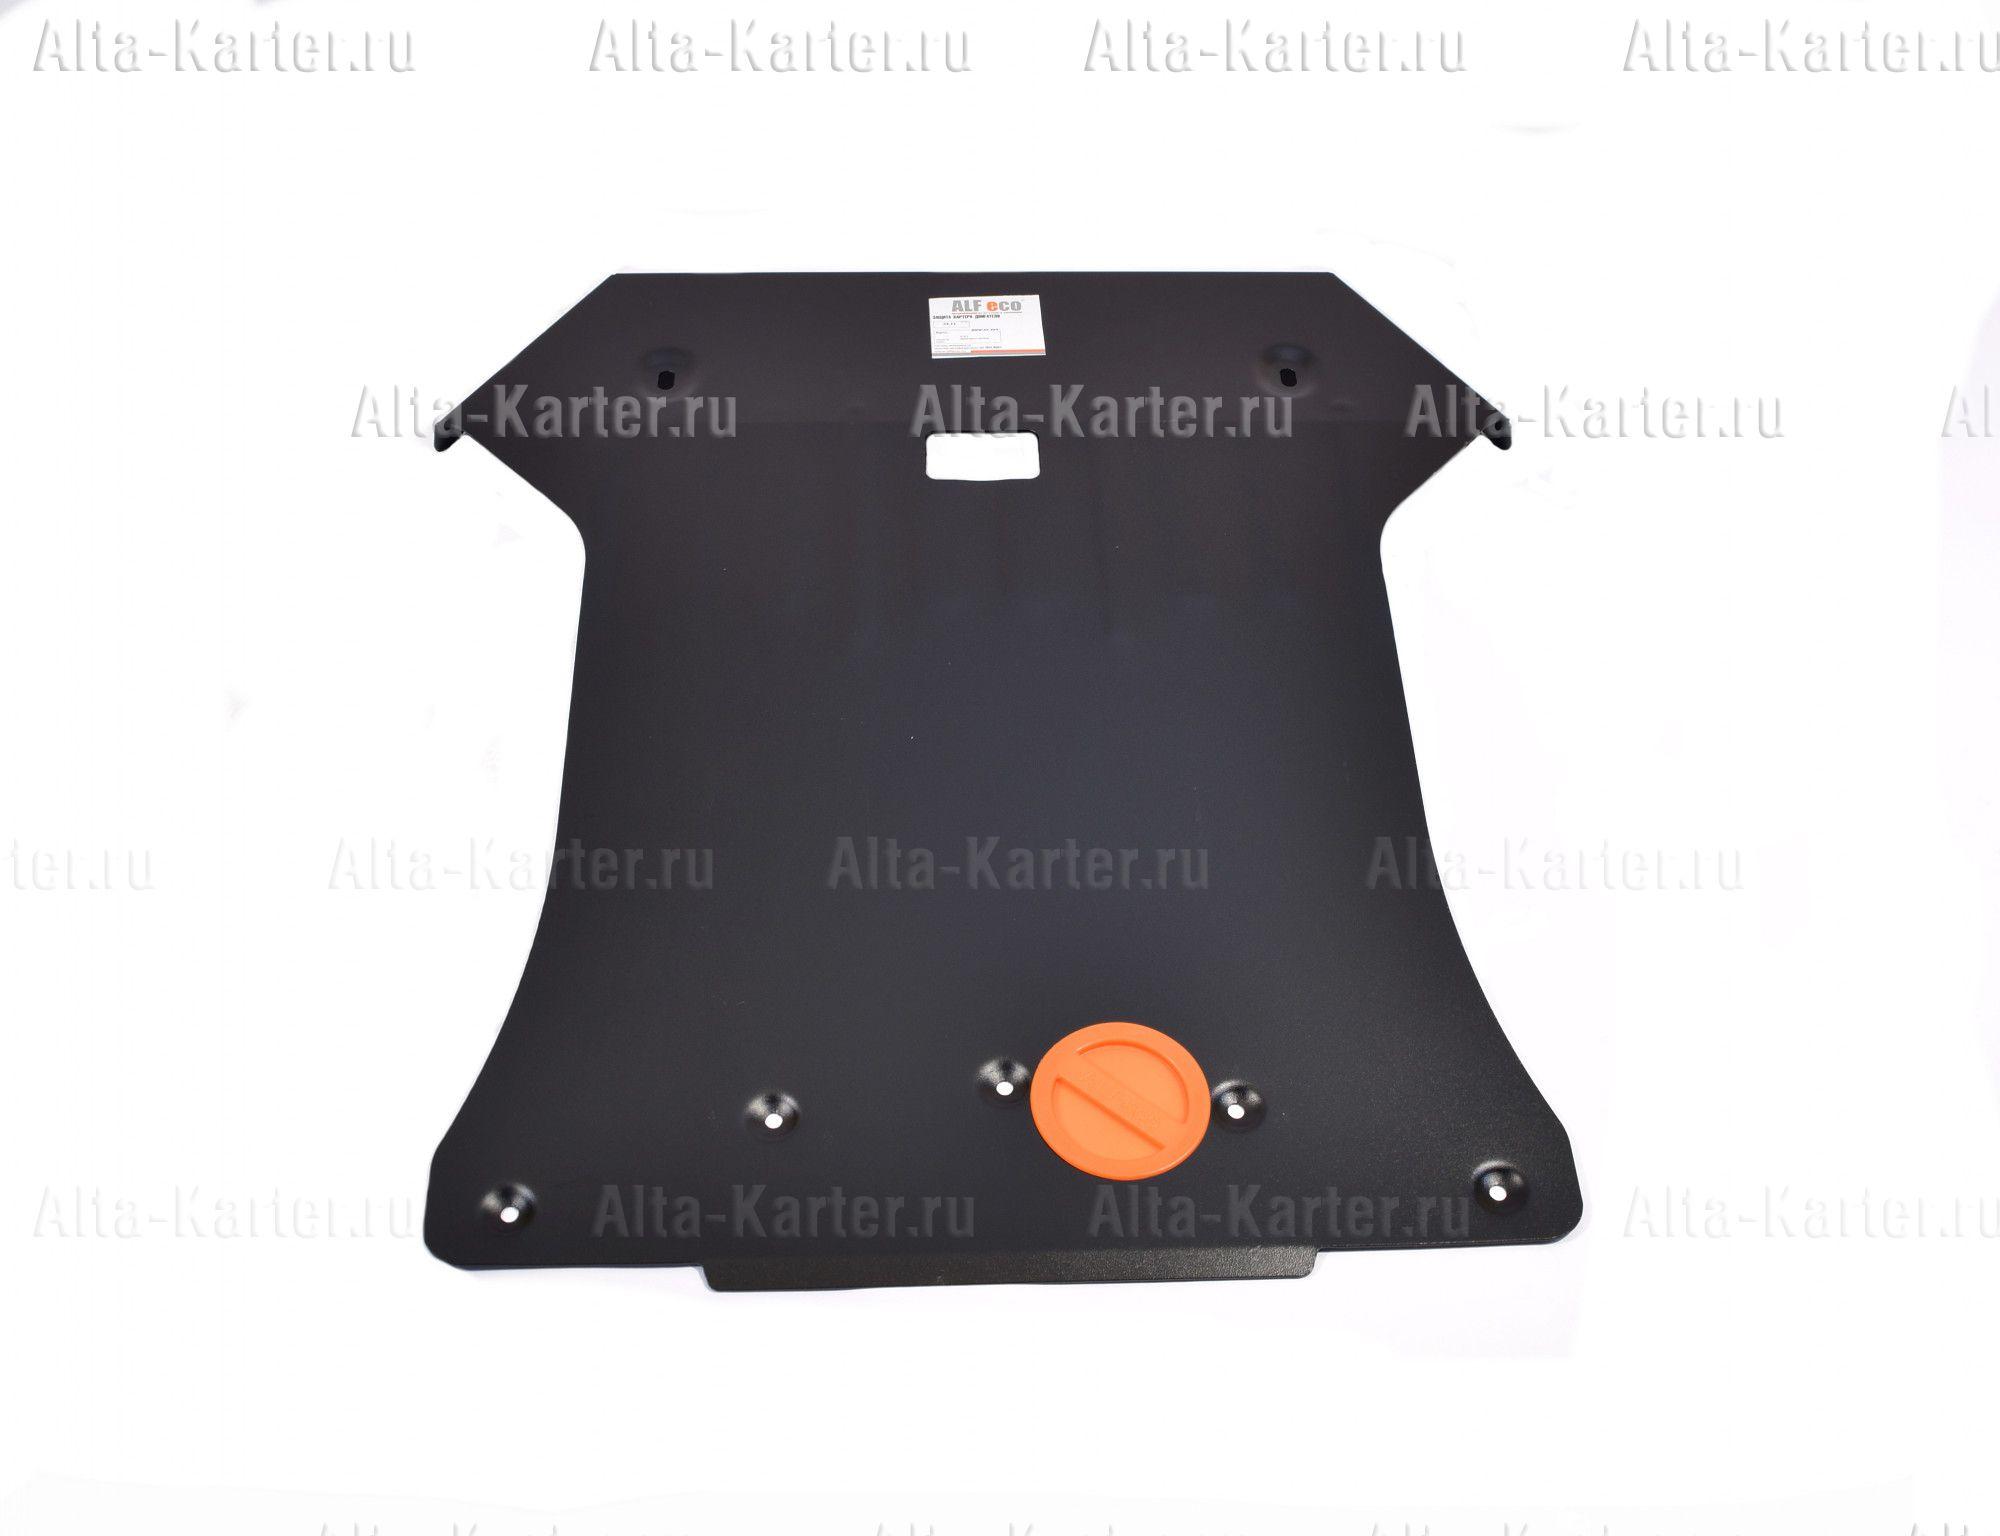 Защита Alfeco для картера и радиатора BMW Х4 F26 2014-2018. Артикул ALF.34.11